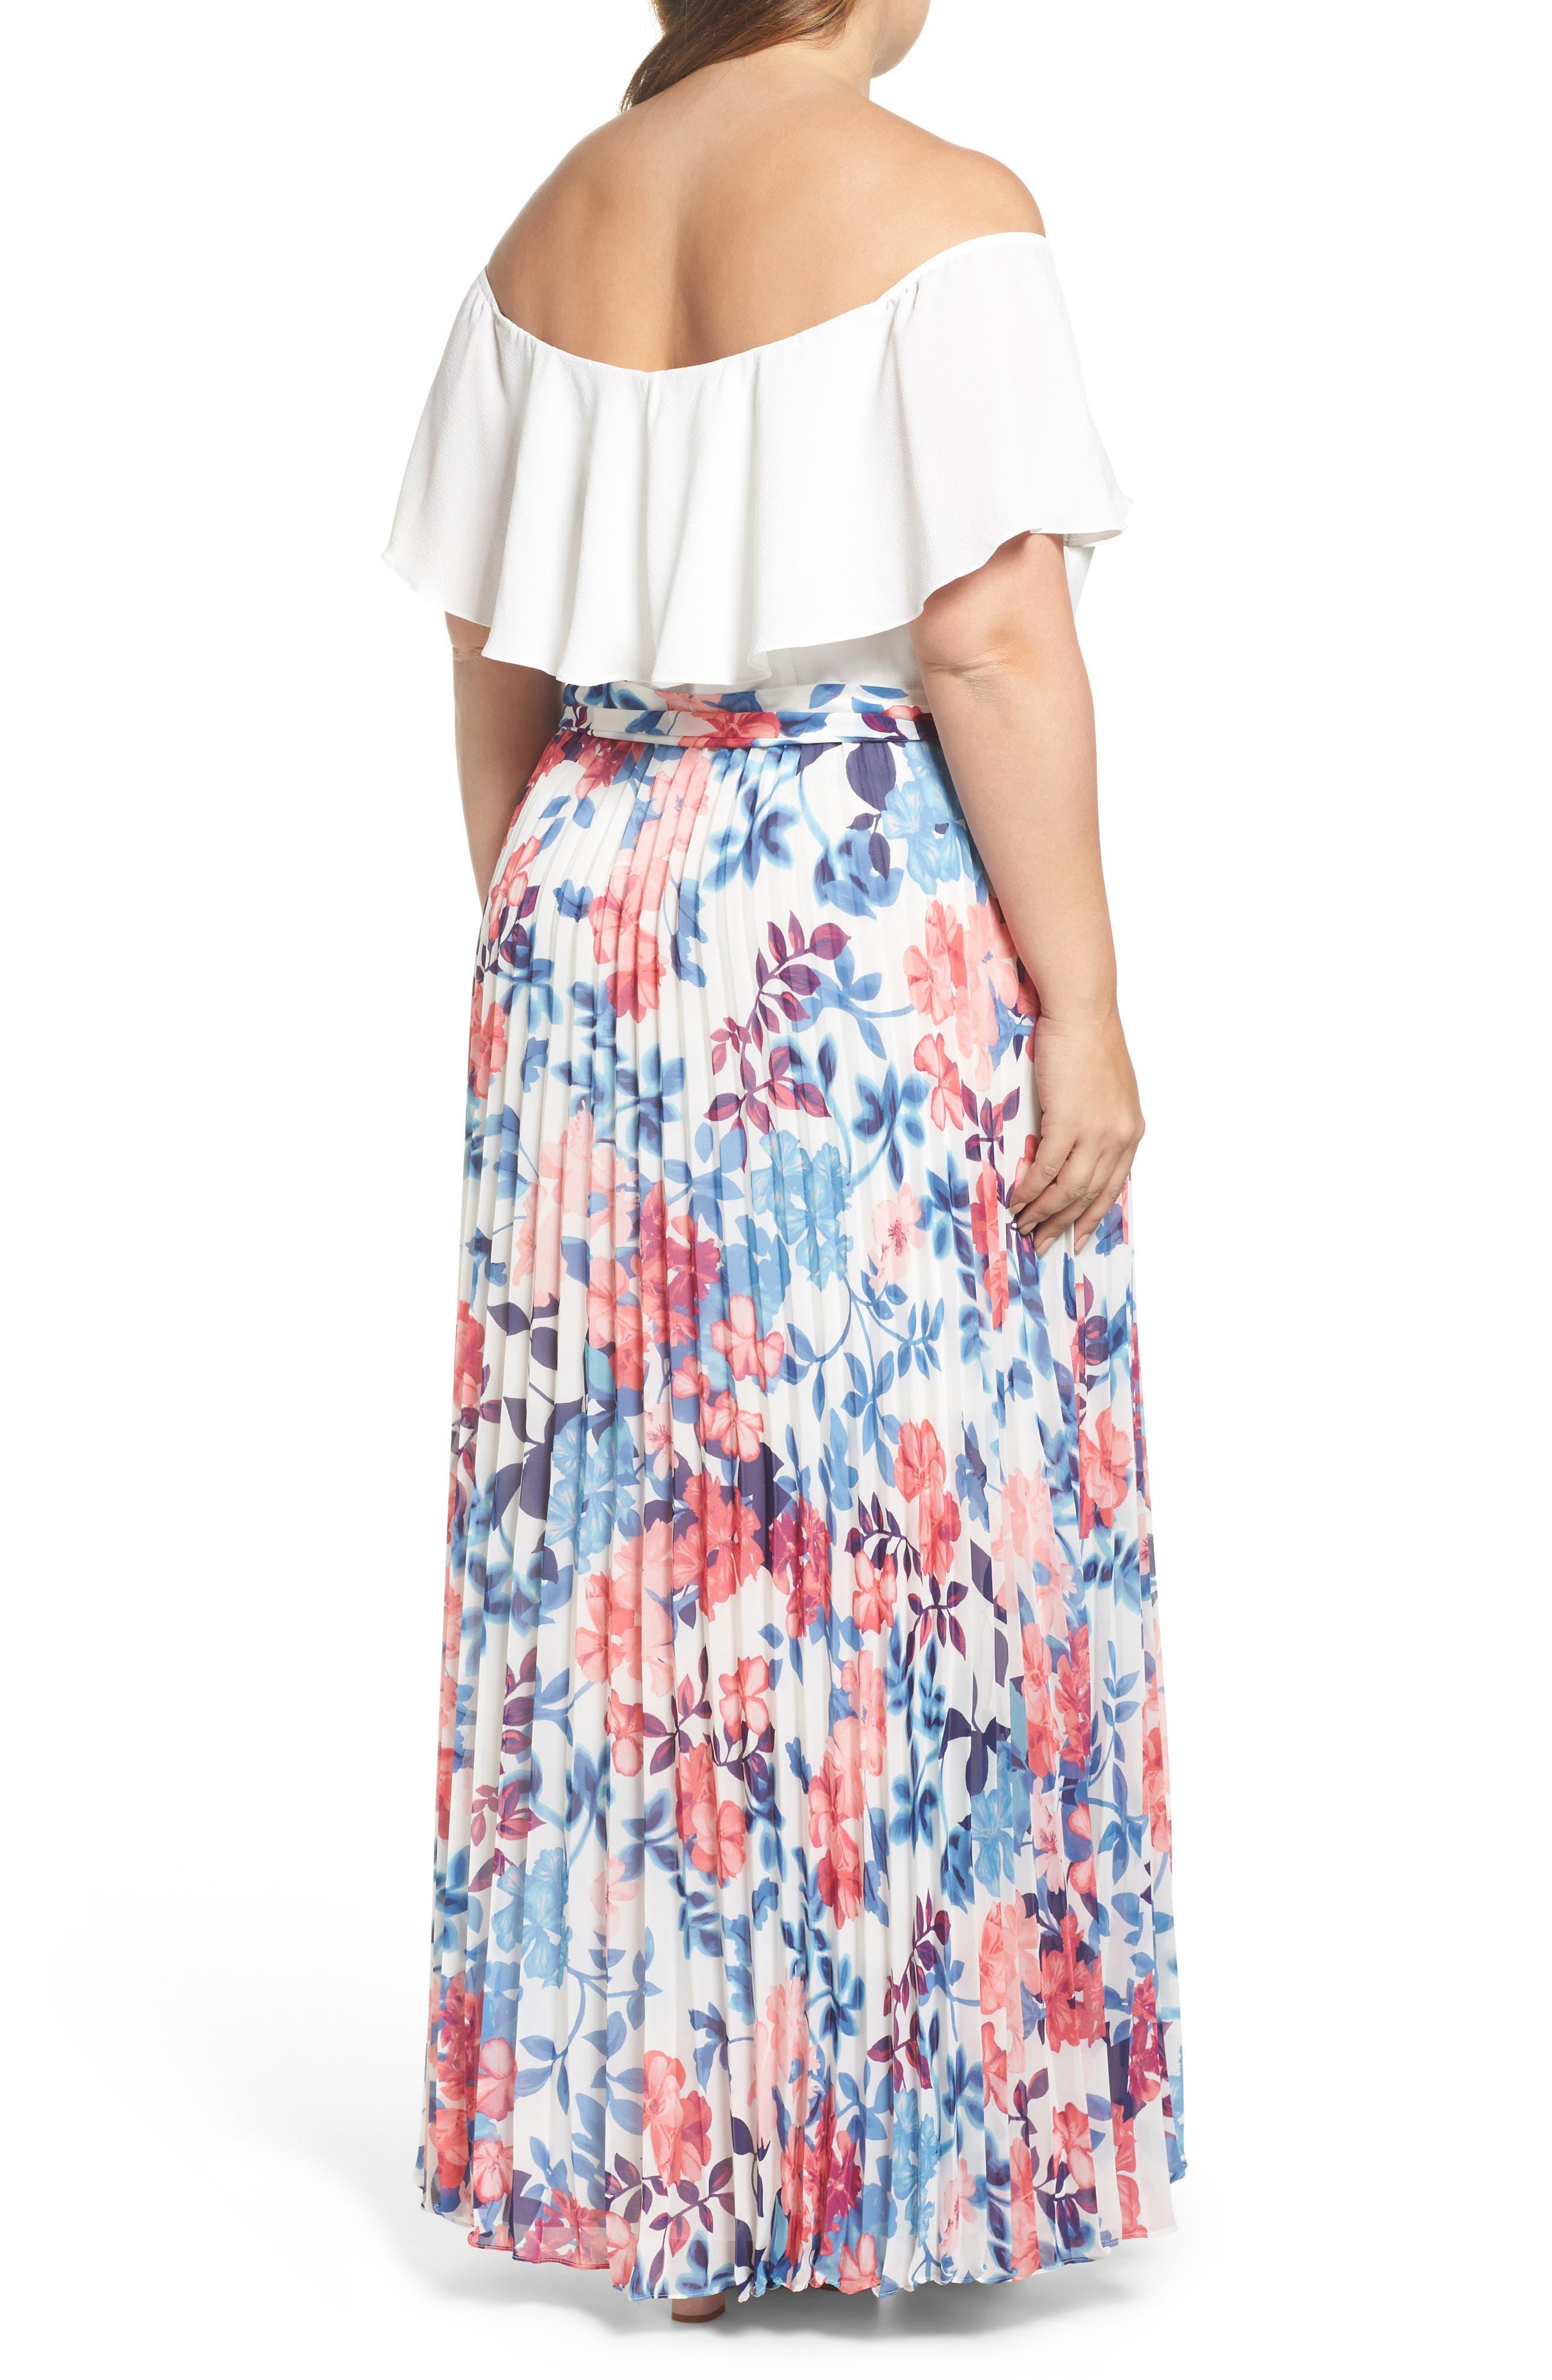 Off the Shoulder Maxi Dress,                             Alternate thumbnail 2, color,                             Ivory Blue